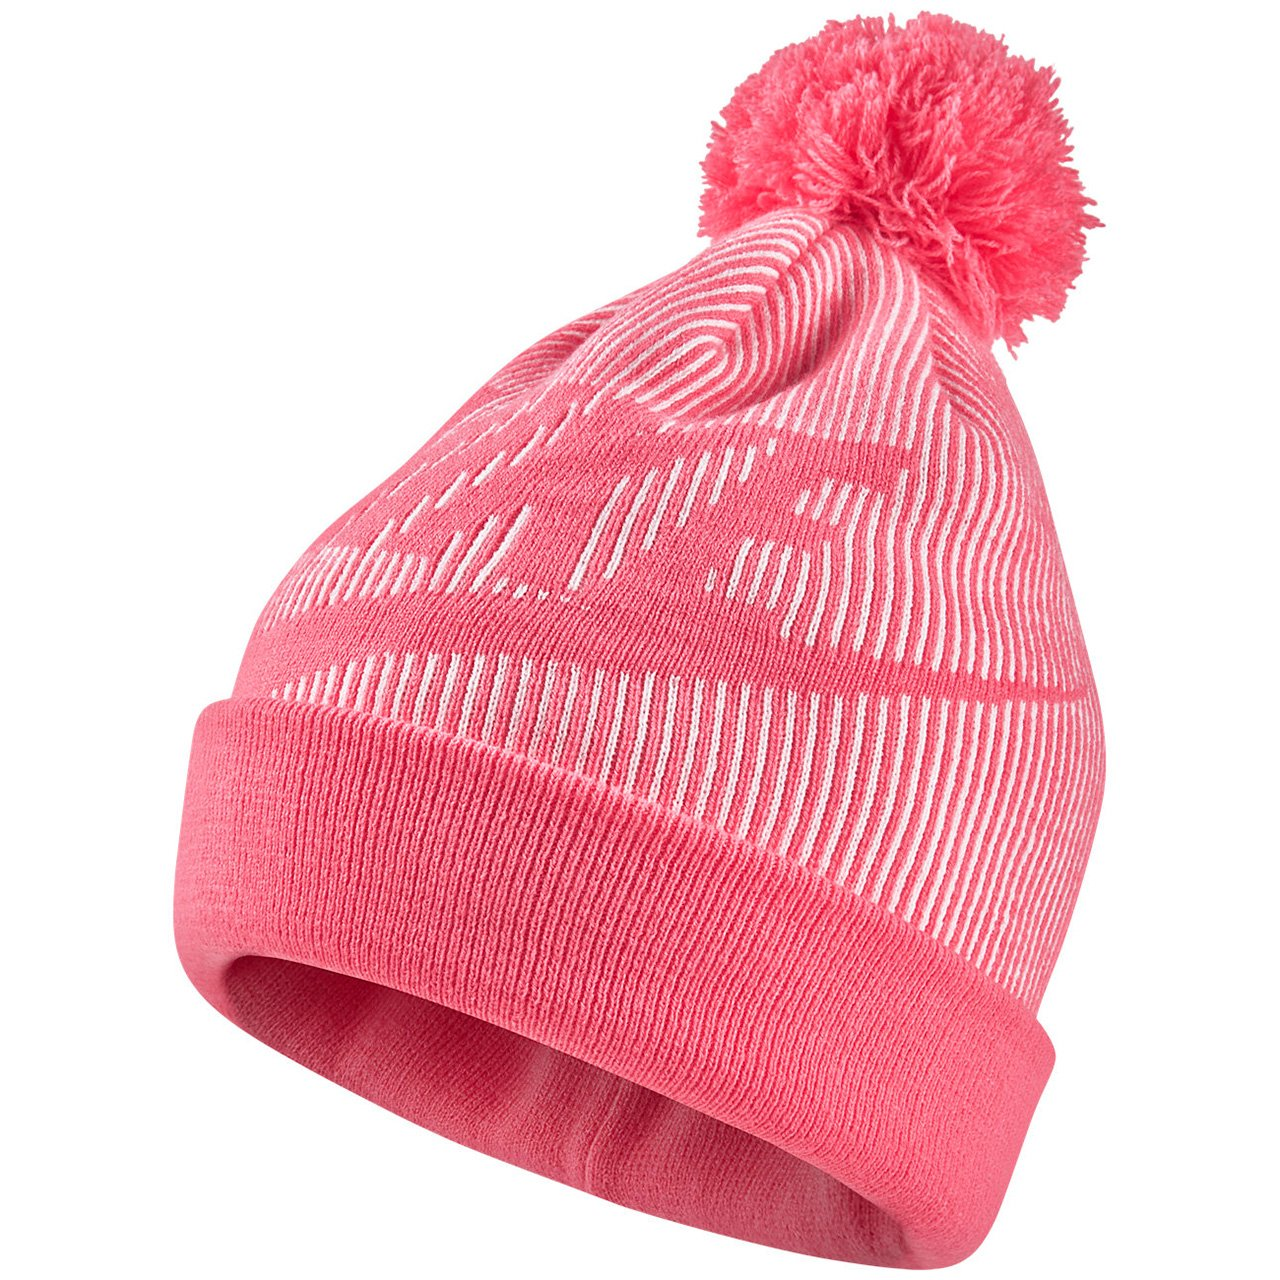 Nike Sportswear Women s Removable Pom Knit Beanie Hat (Pink Nebula) at  Amazon Women s Clothing store  690d6b04fae